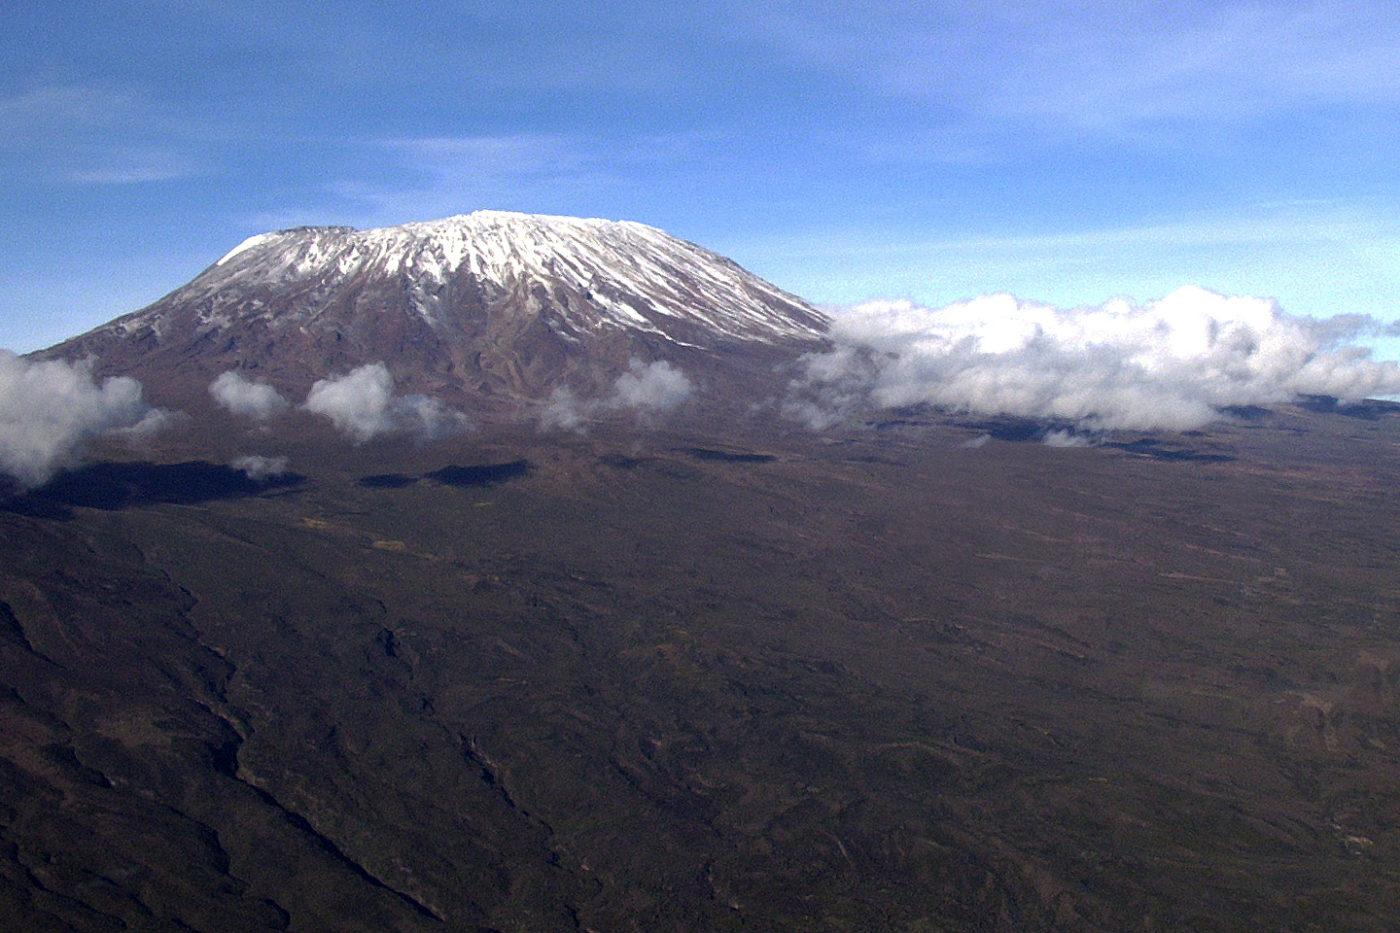 Kilimangiaro Tanzania